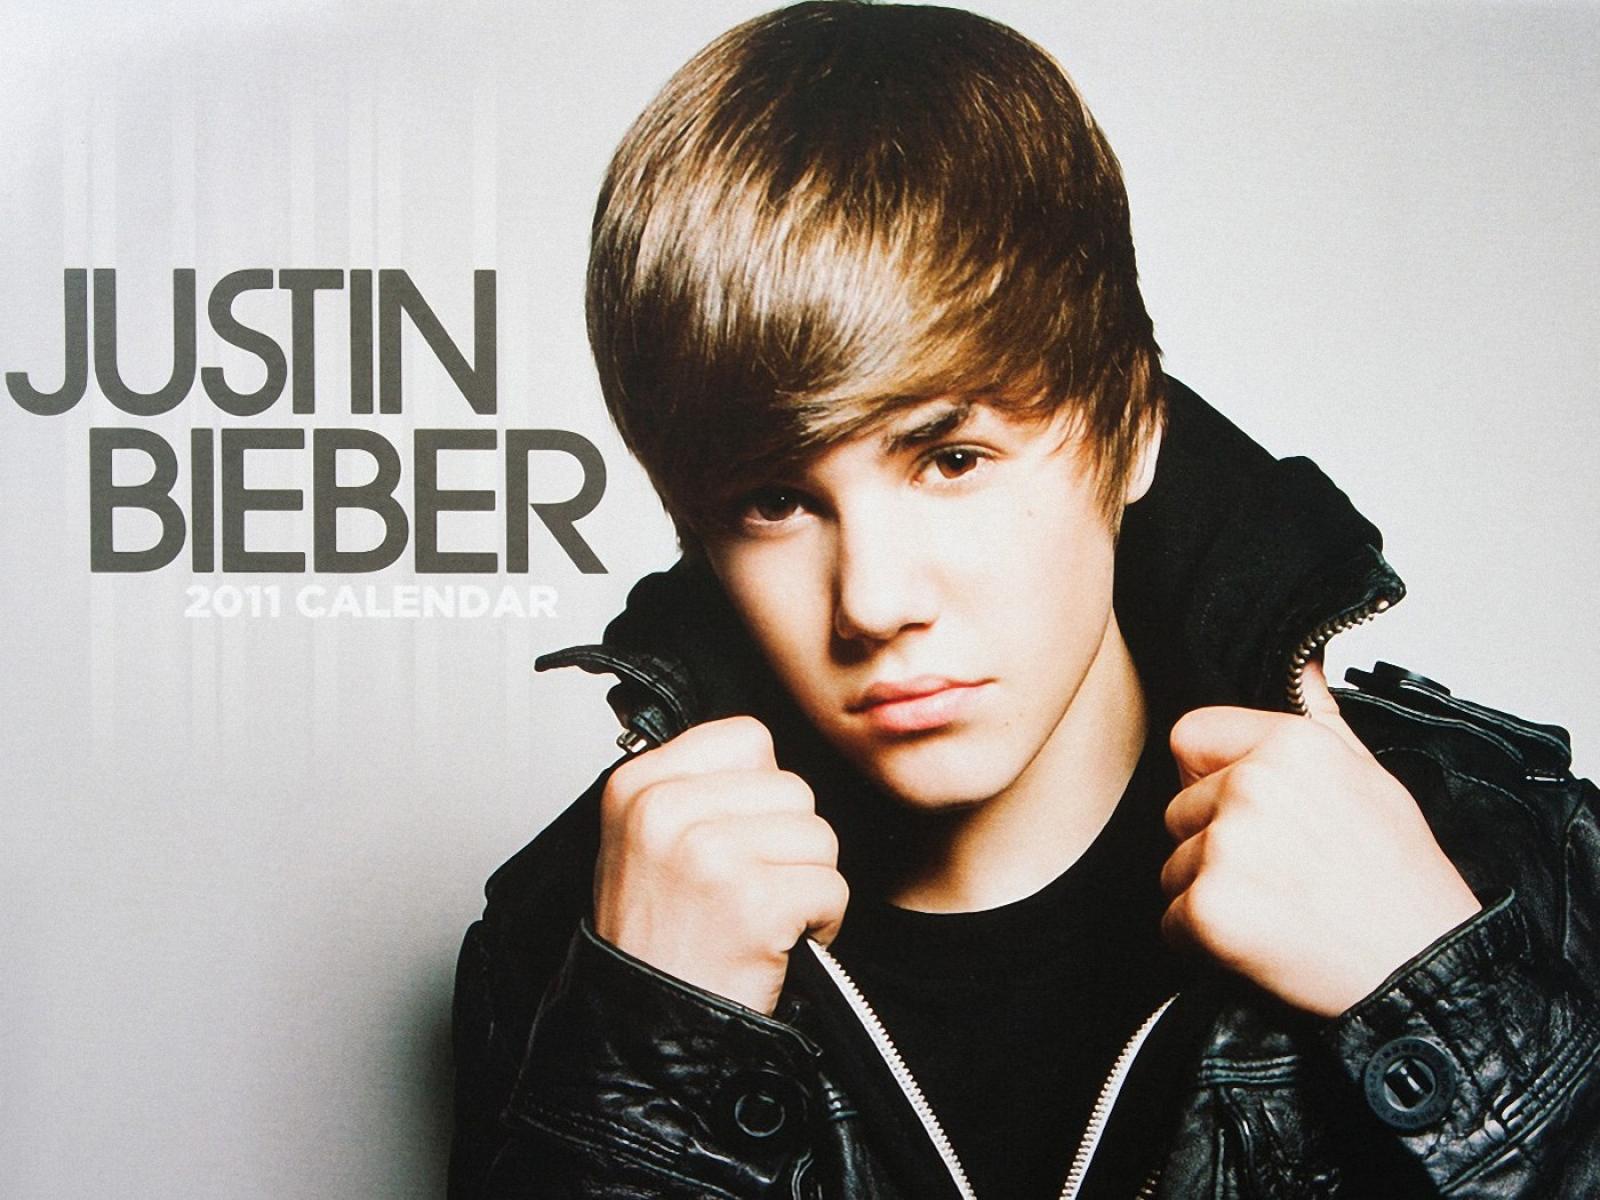 Justin Bieber During Photoshoot